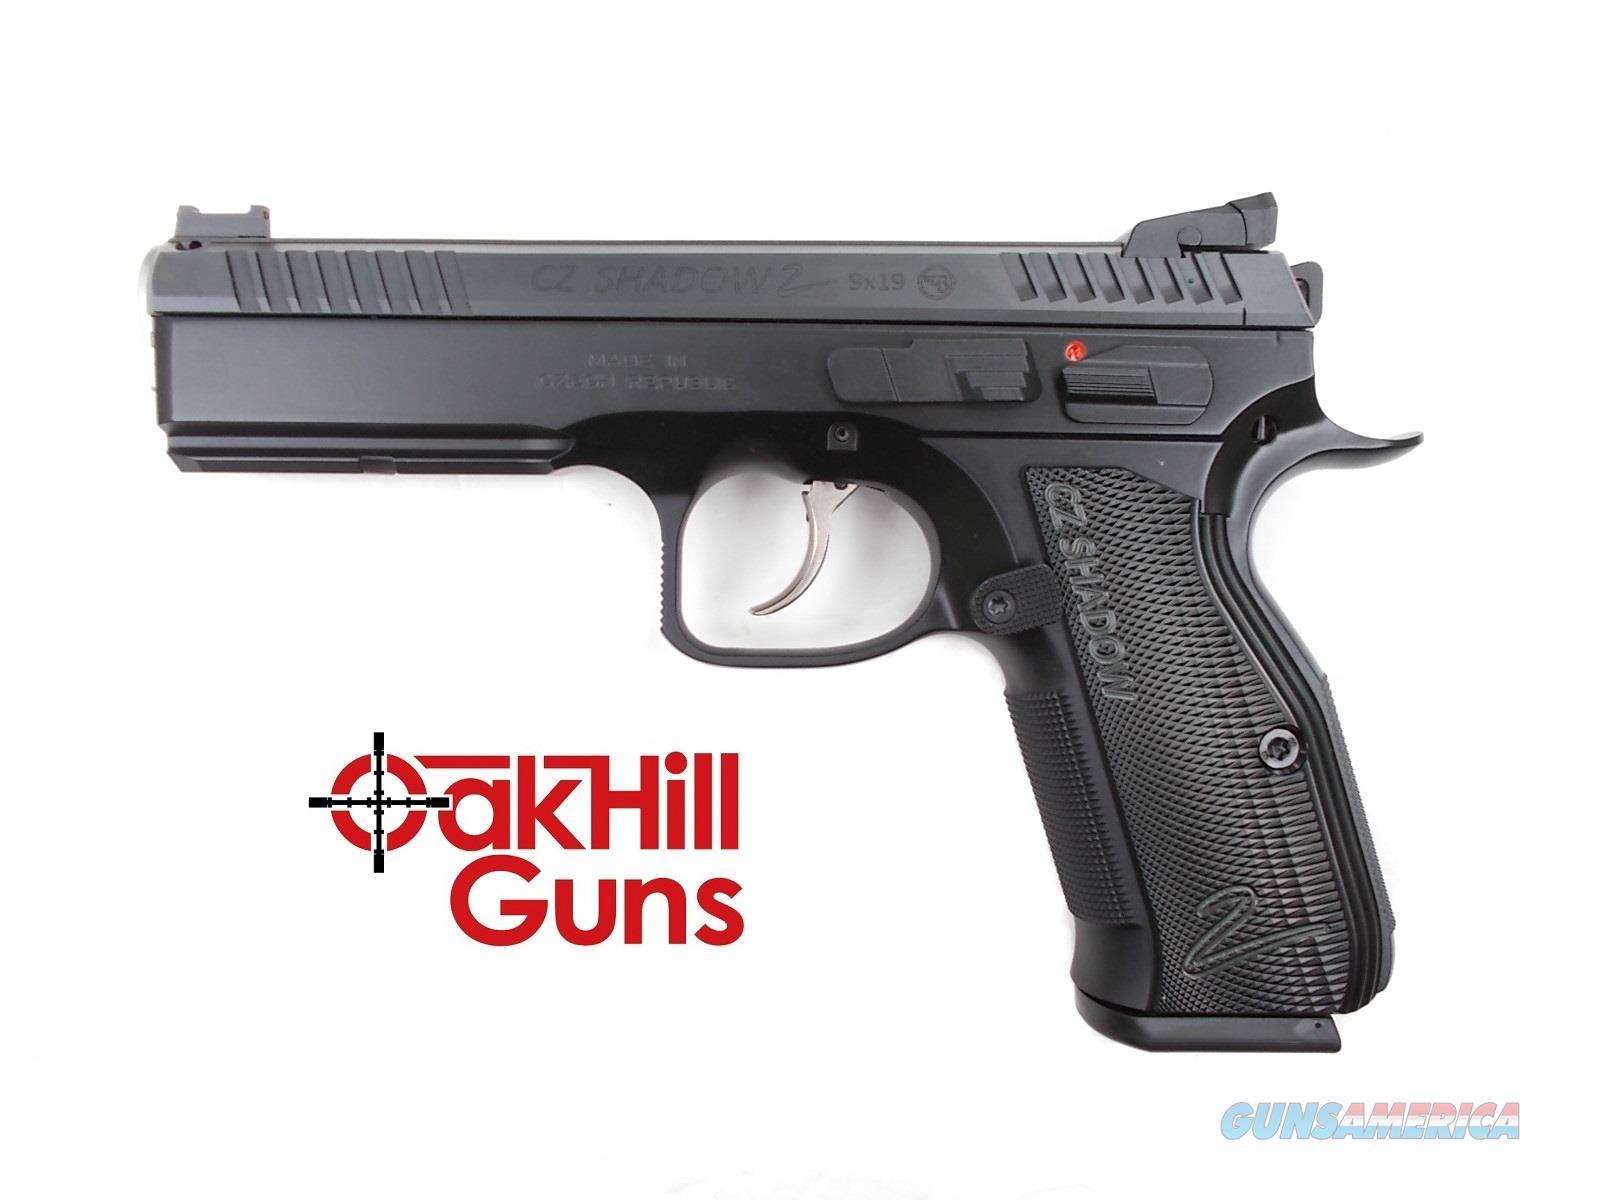 CZ Shadow 2 Accu CZC Custom 3 - 17 rd Mags 91763 *NIB*  Guns > Pistols > CZ Pistols